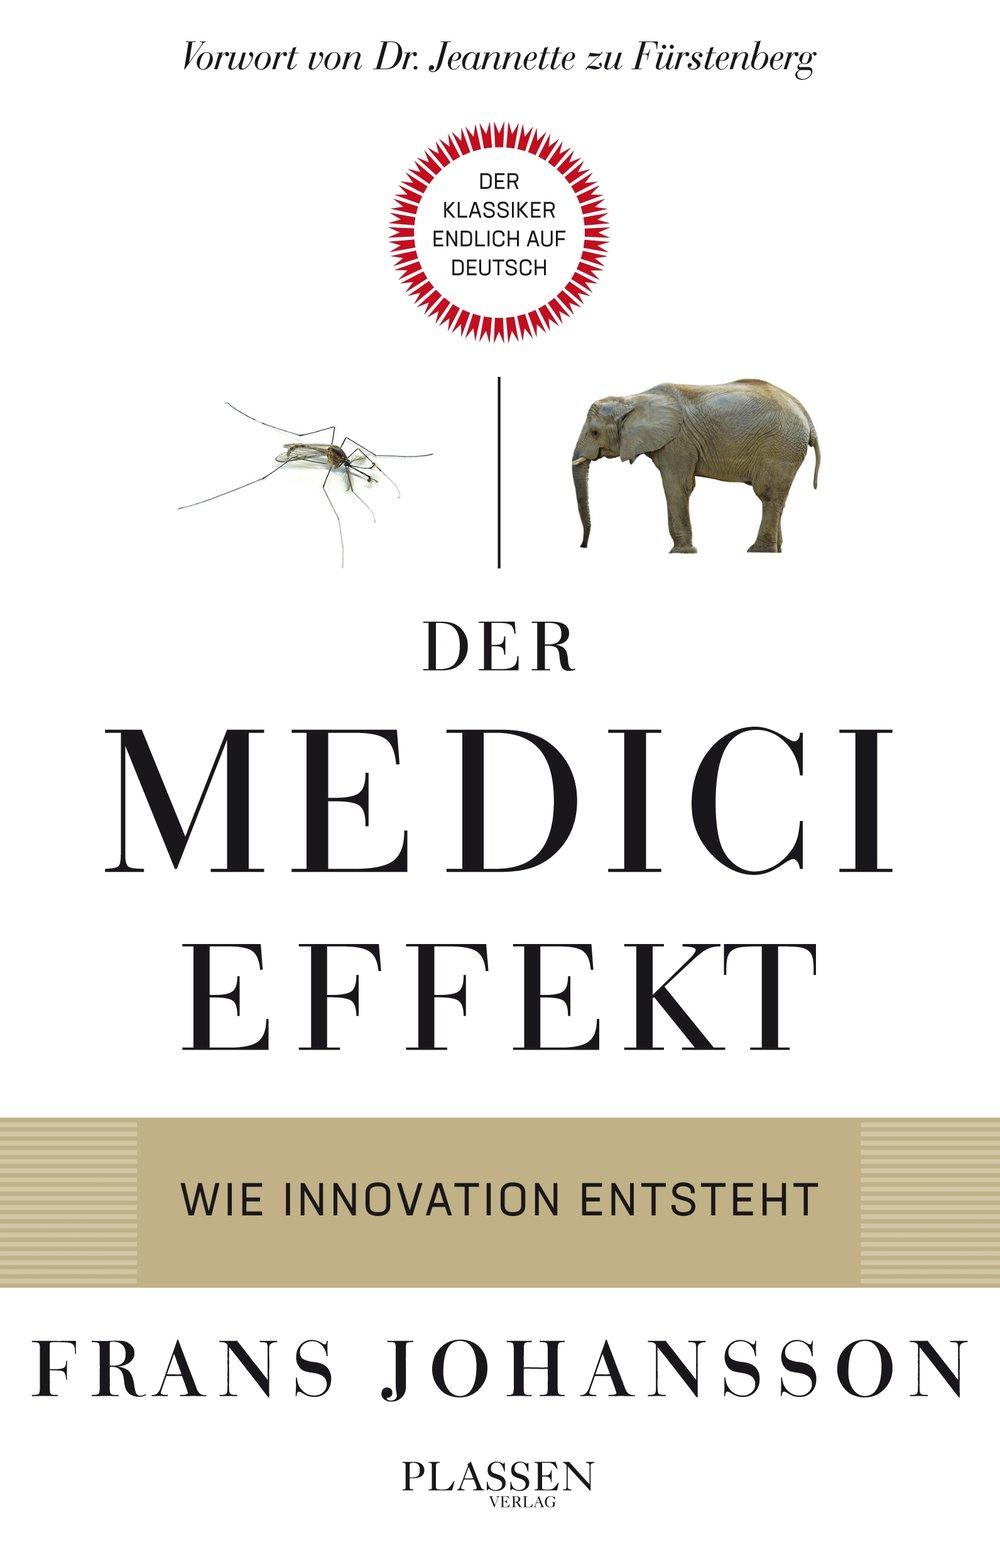 Der Medici_Effekt_2D_300dpi_rgb.jpg